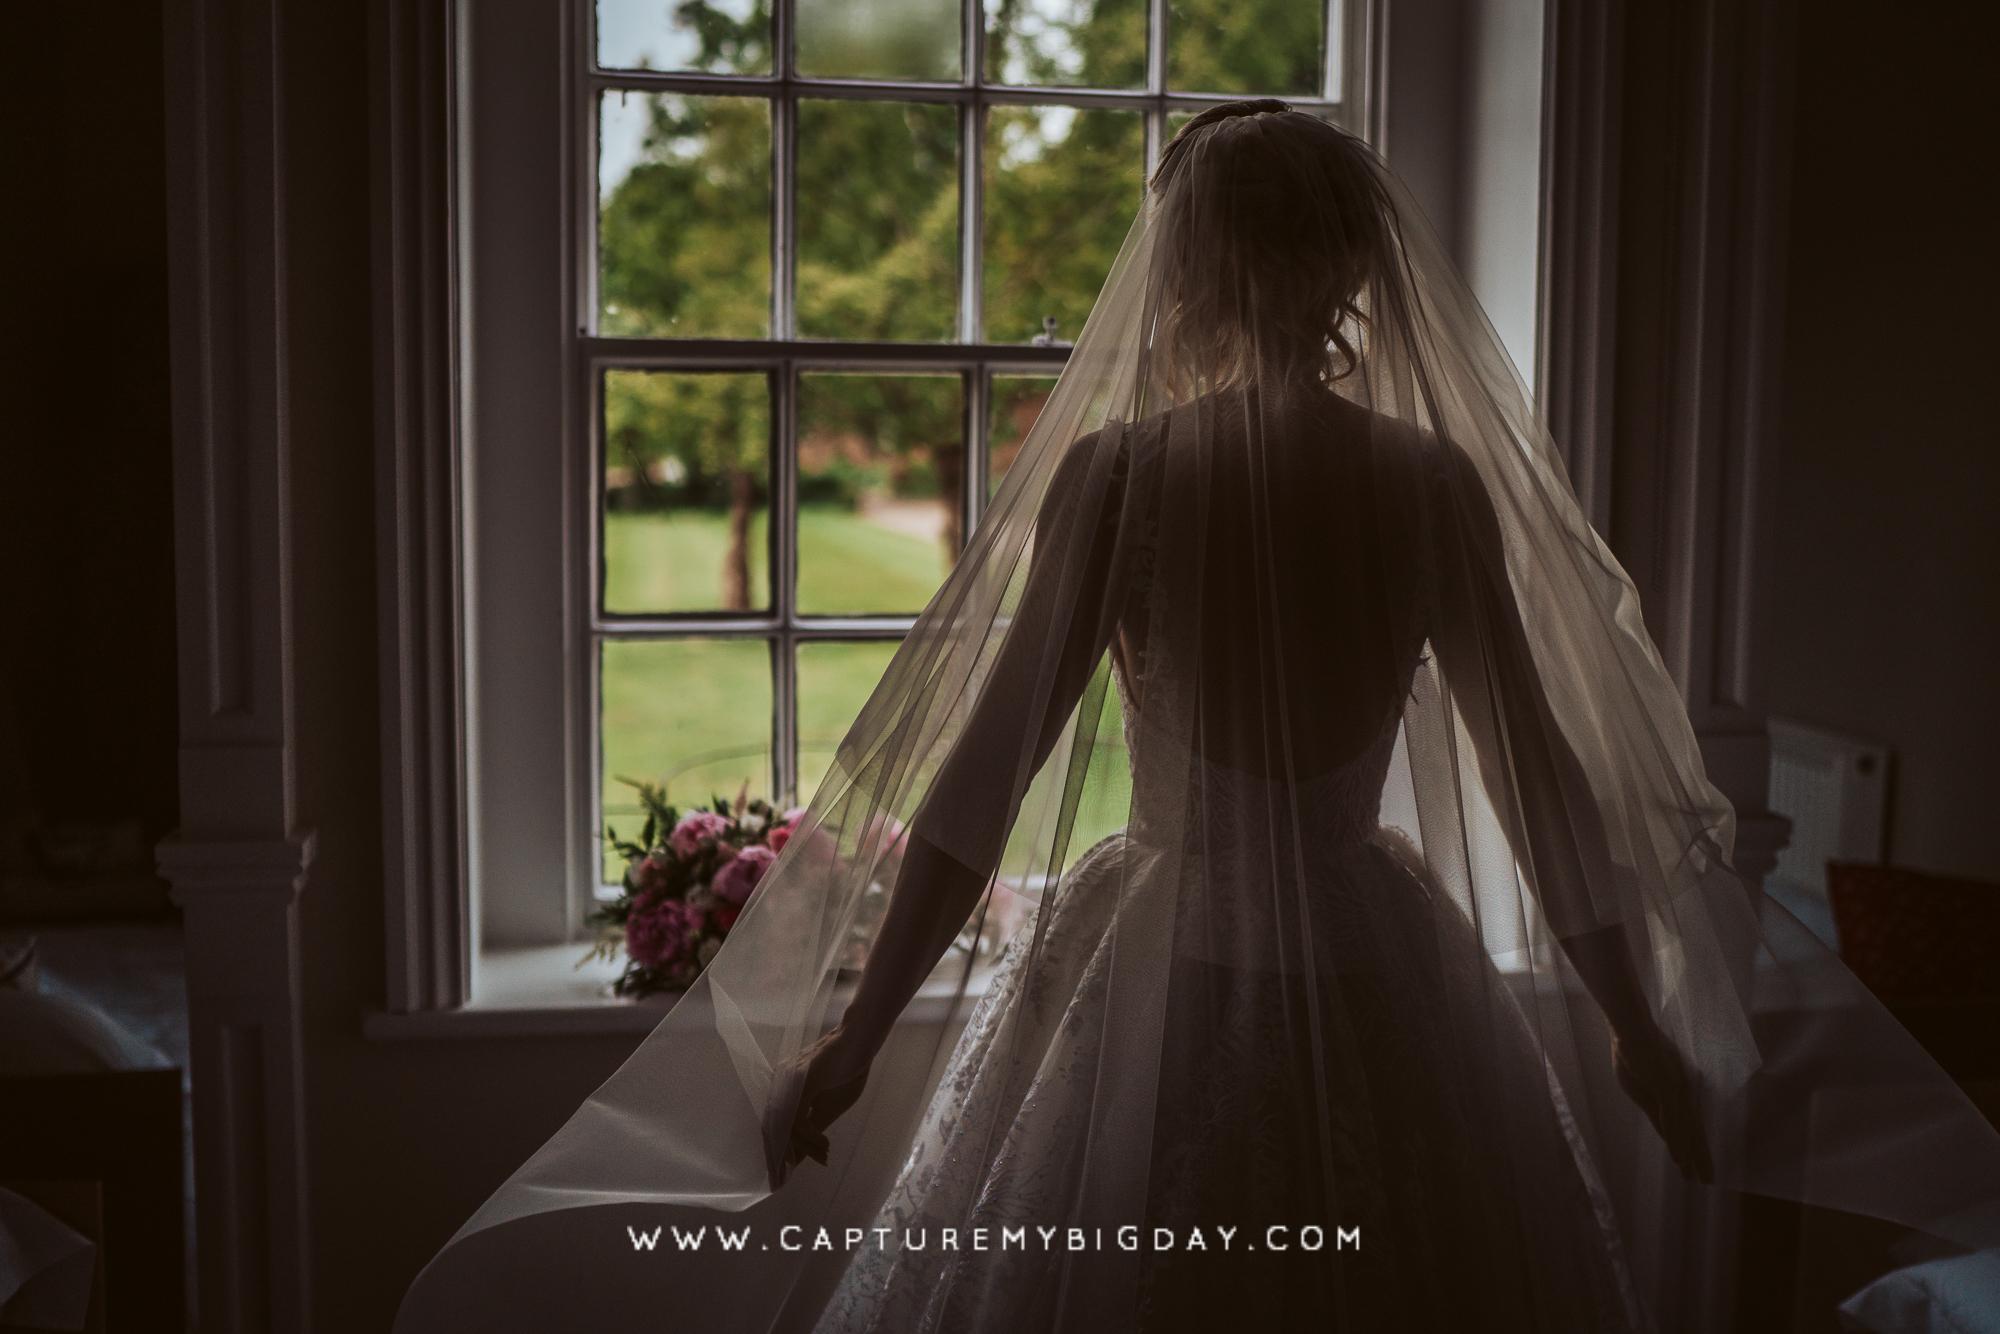 bride looking out of window in wedding dress